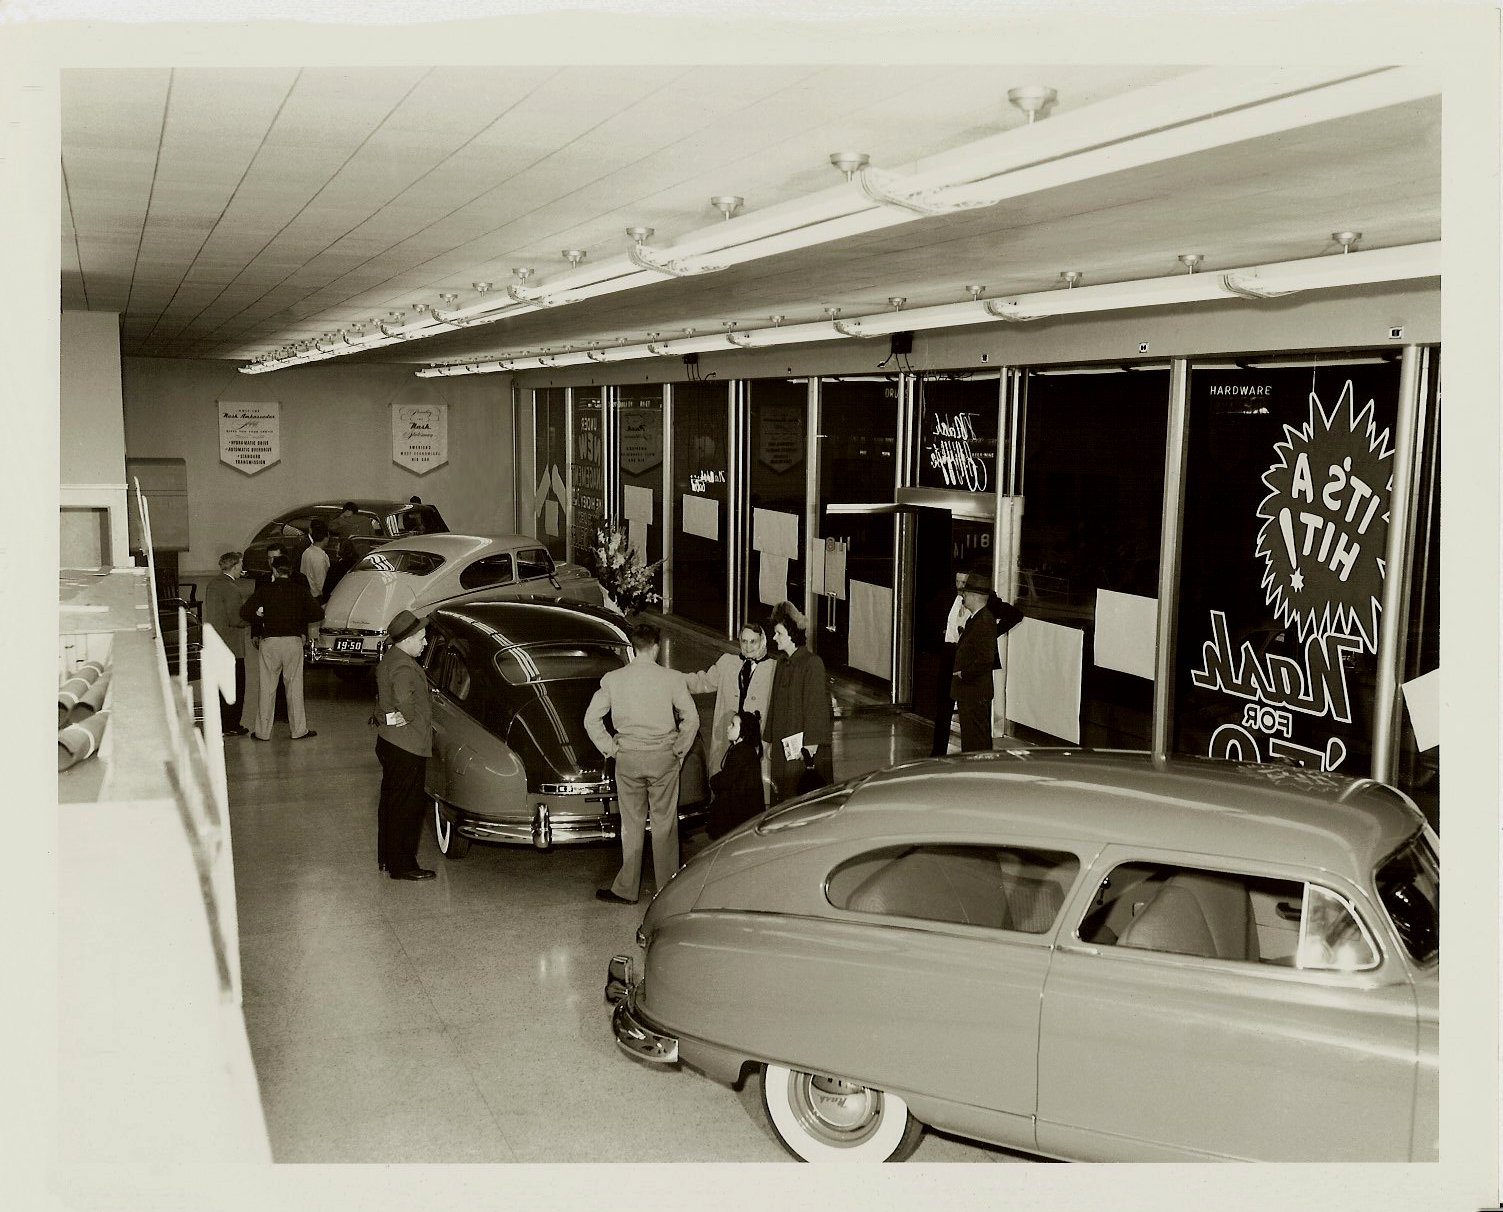 1950 NASH automobiles NASH Automobile Dealership Grosse Pointe, Michigan ca. 1950 10″x8″ Black & White photograph